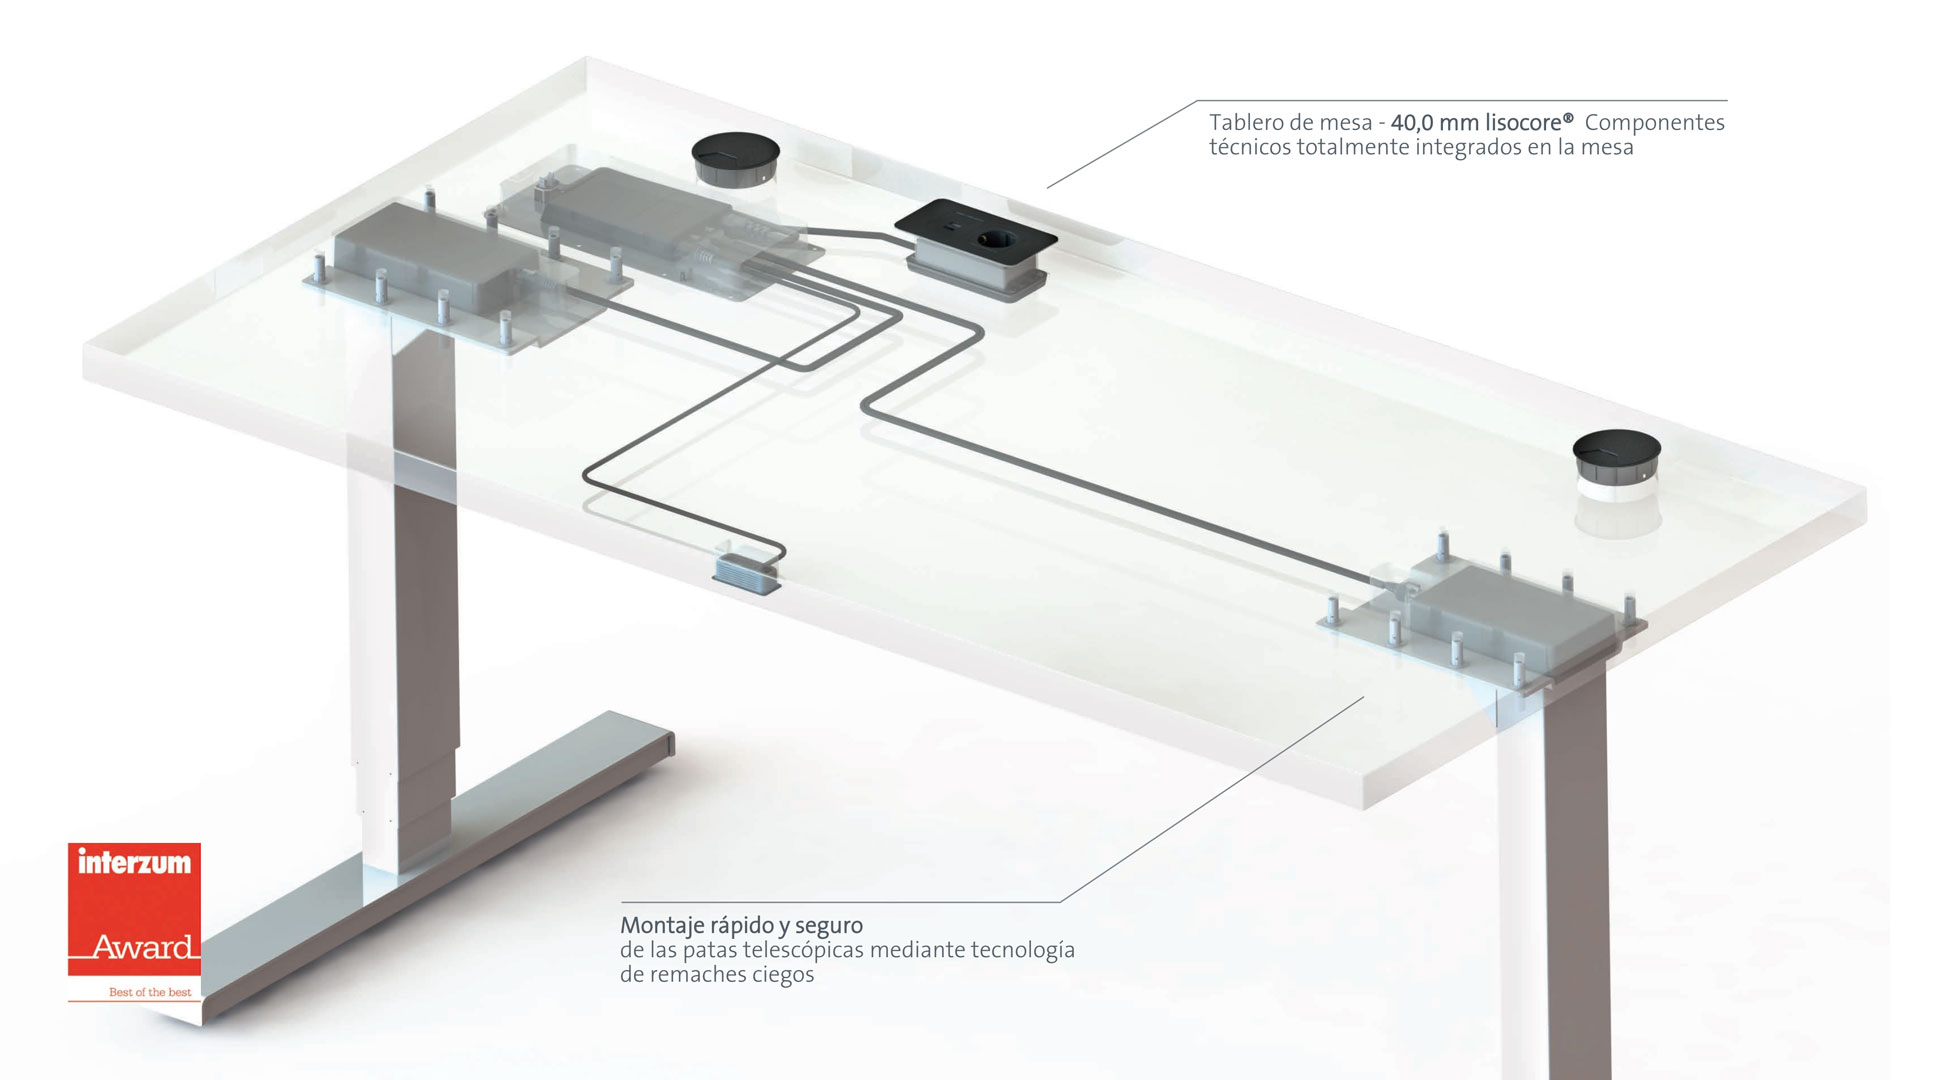 lisocore elementos electricos integrados